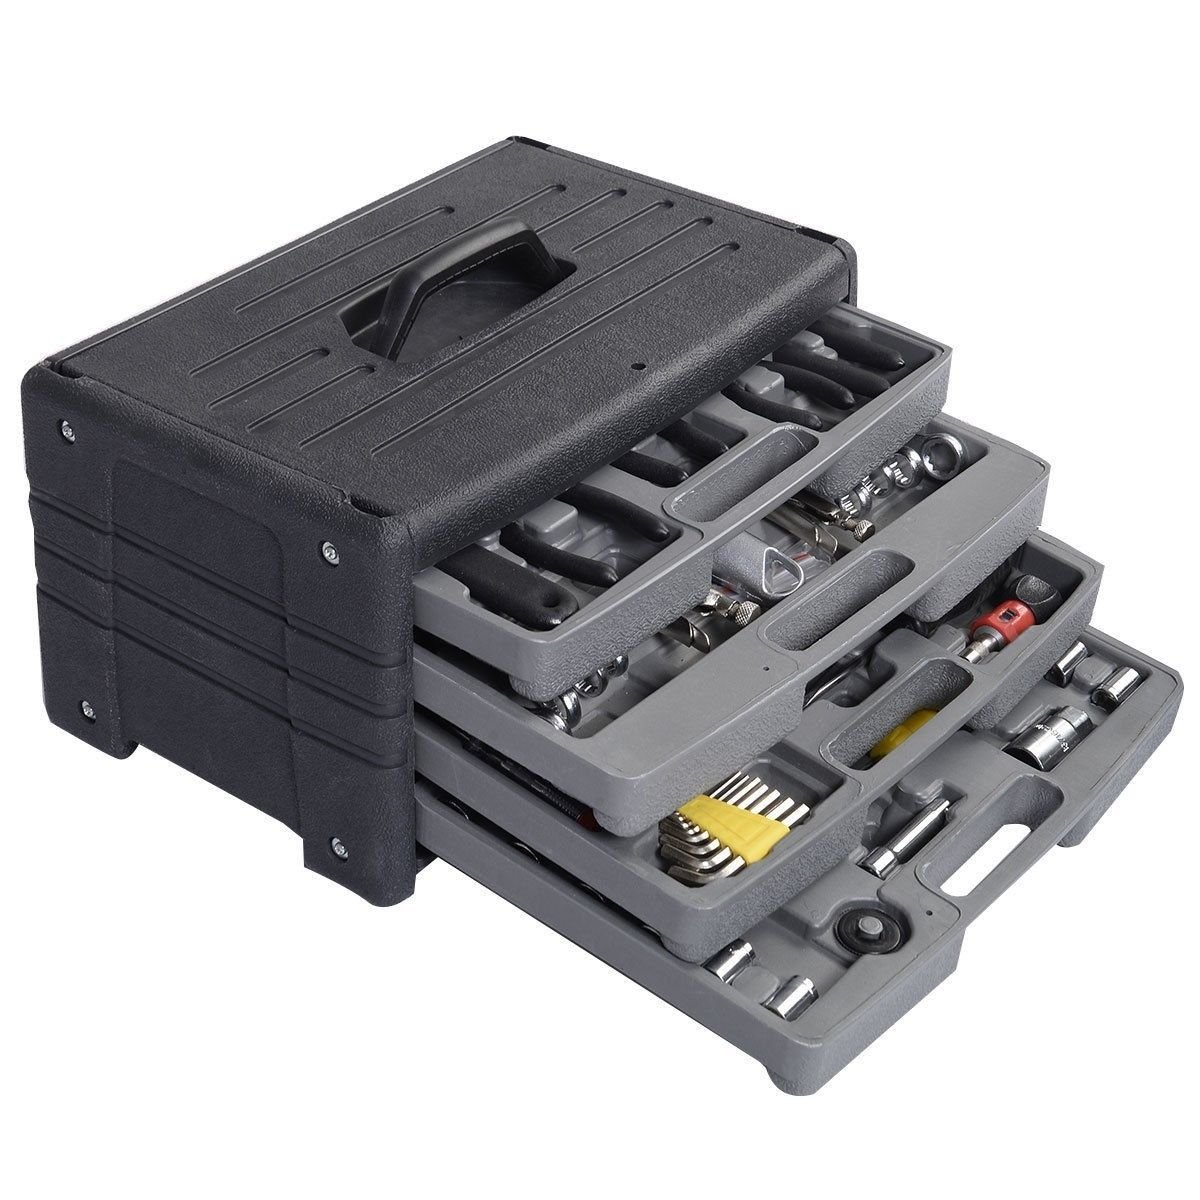 Garage Tool Mechanic's Tool Kit Set Shop Vehicle Repair Four Floors 99pcs NEW ,product_by: patsbargainhut14 it#72252460397834